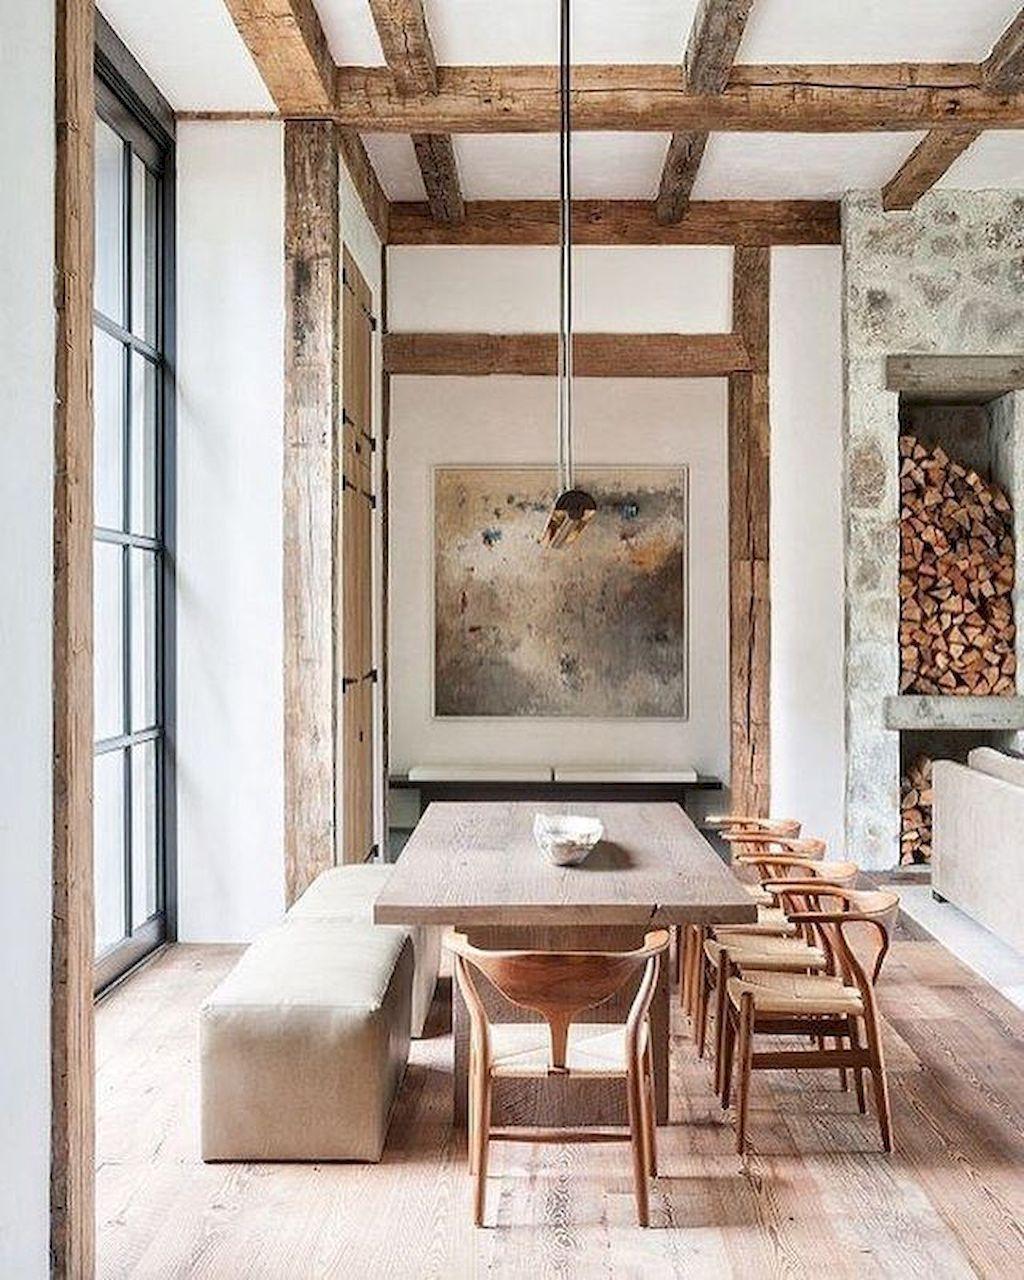 Rustic Modern Dining Room Ideas: 47 Modern Farmhouse Dining Room Decor Ideas In 2019